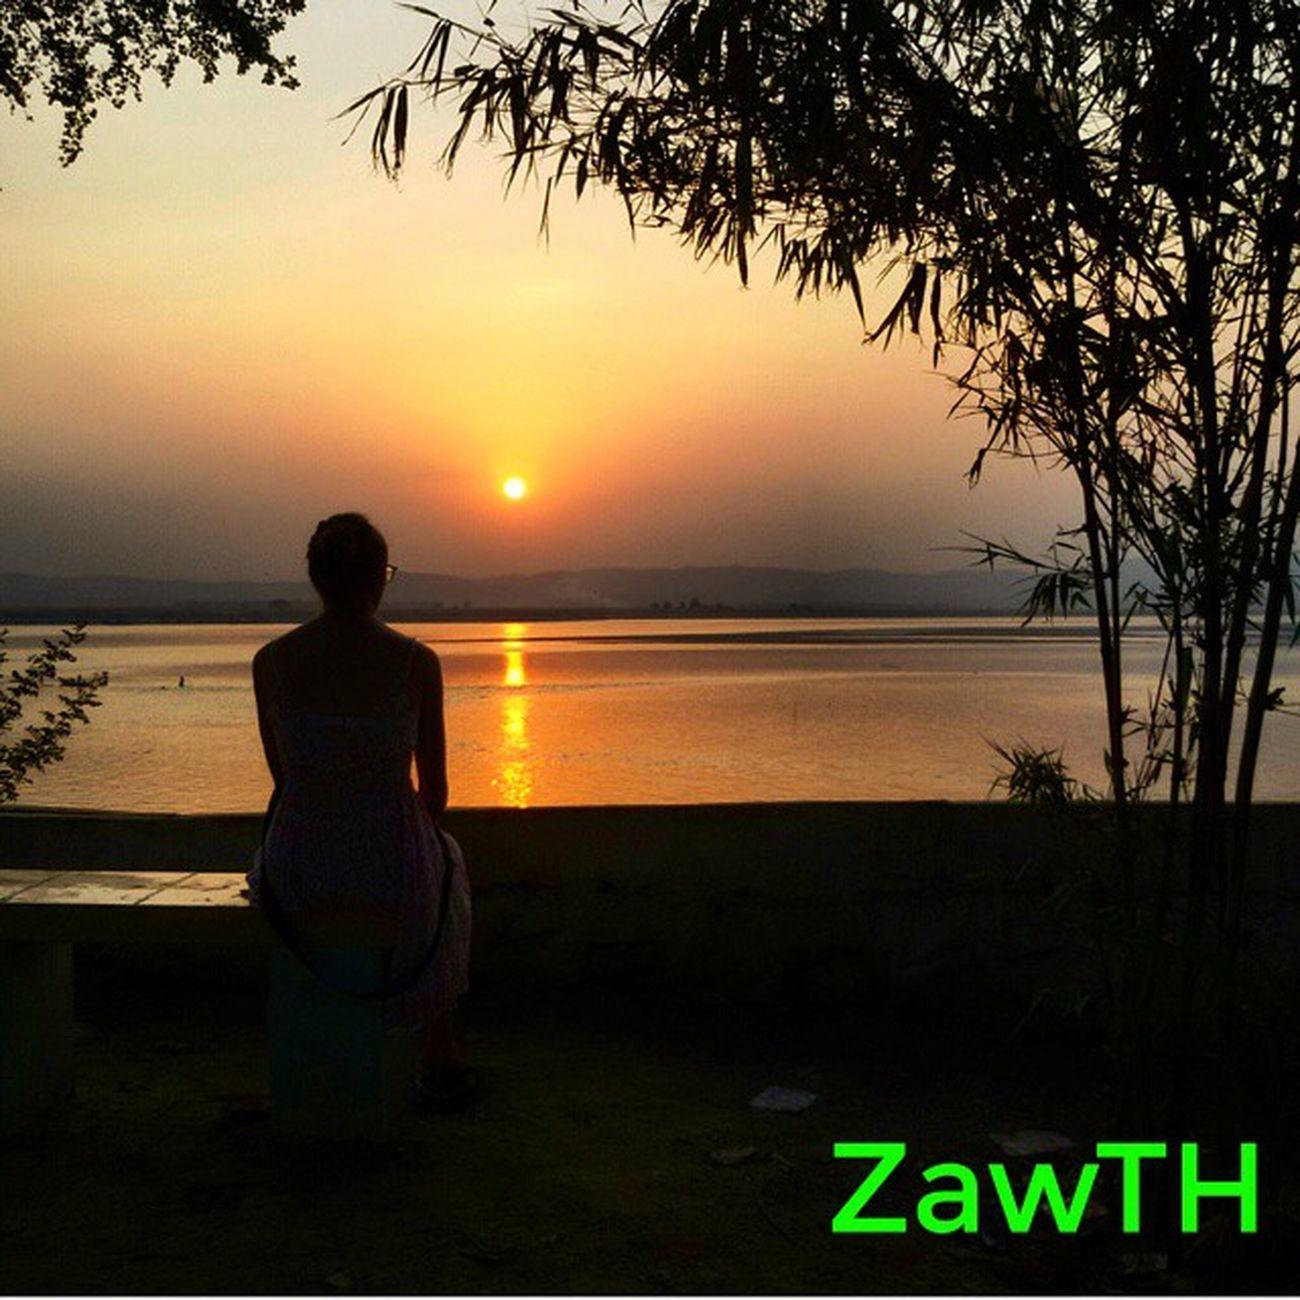 By taking oaths in God´s name..... I say that I had waited till the sunset.... ဘုရားစူး ၿပီးေျပာပါရ ေသာ္..... ေနဝင္သည့္ တိုင္ ေစာင့္ခဲ့သည္သာ .... Sunsetaroundtheworld Sunset Mandalay Myanmar Bumra Igersmyanmar Igersmandalay Myanmarphotos Vscomyanmar Exploremyanmar Goldenland Ayeyarwaddy Irrawaddy Bsn_sky Bsn_reflection Bsn_sunset Bsn_family Nothingordinary Sunsets Sunsetmadness Igerssunset Ig_sunsetshots Mycapture GalaxyGrand2 Zawth asean aseantravel aseanchannel